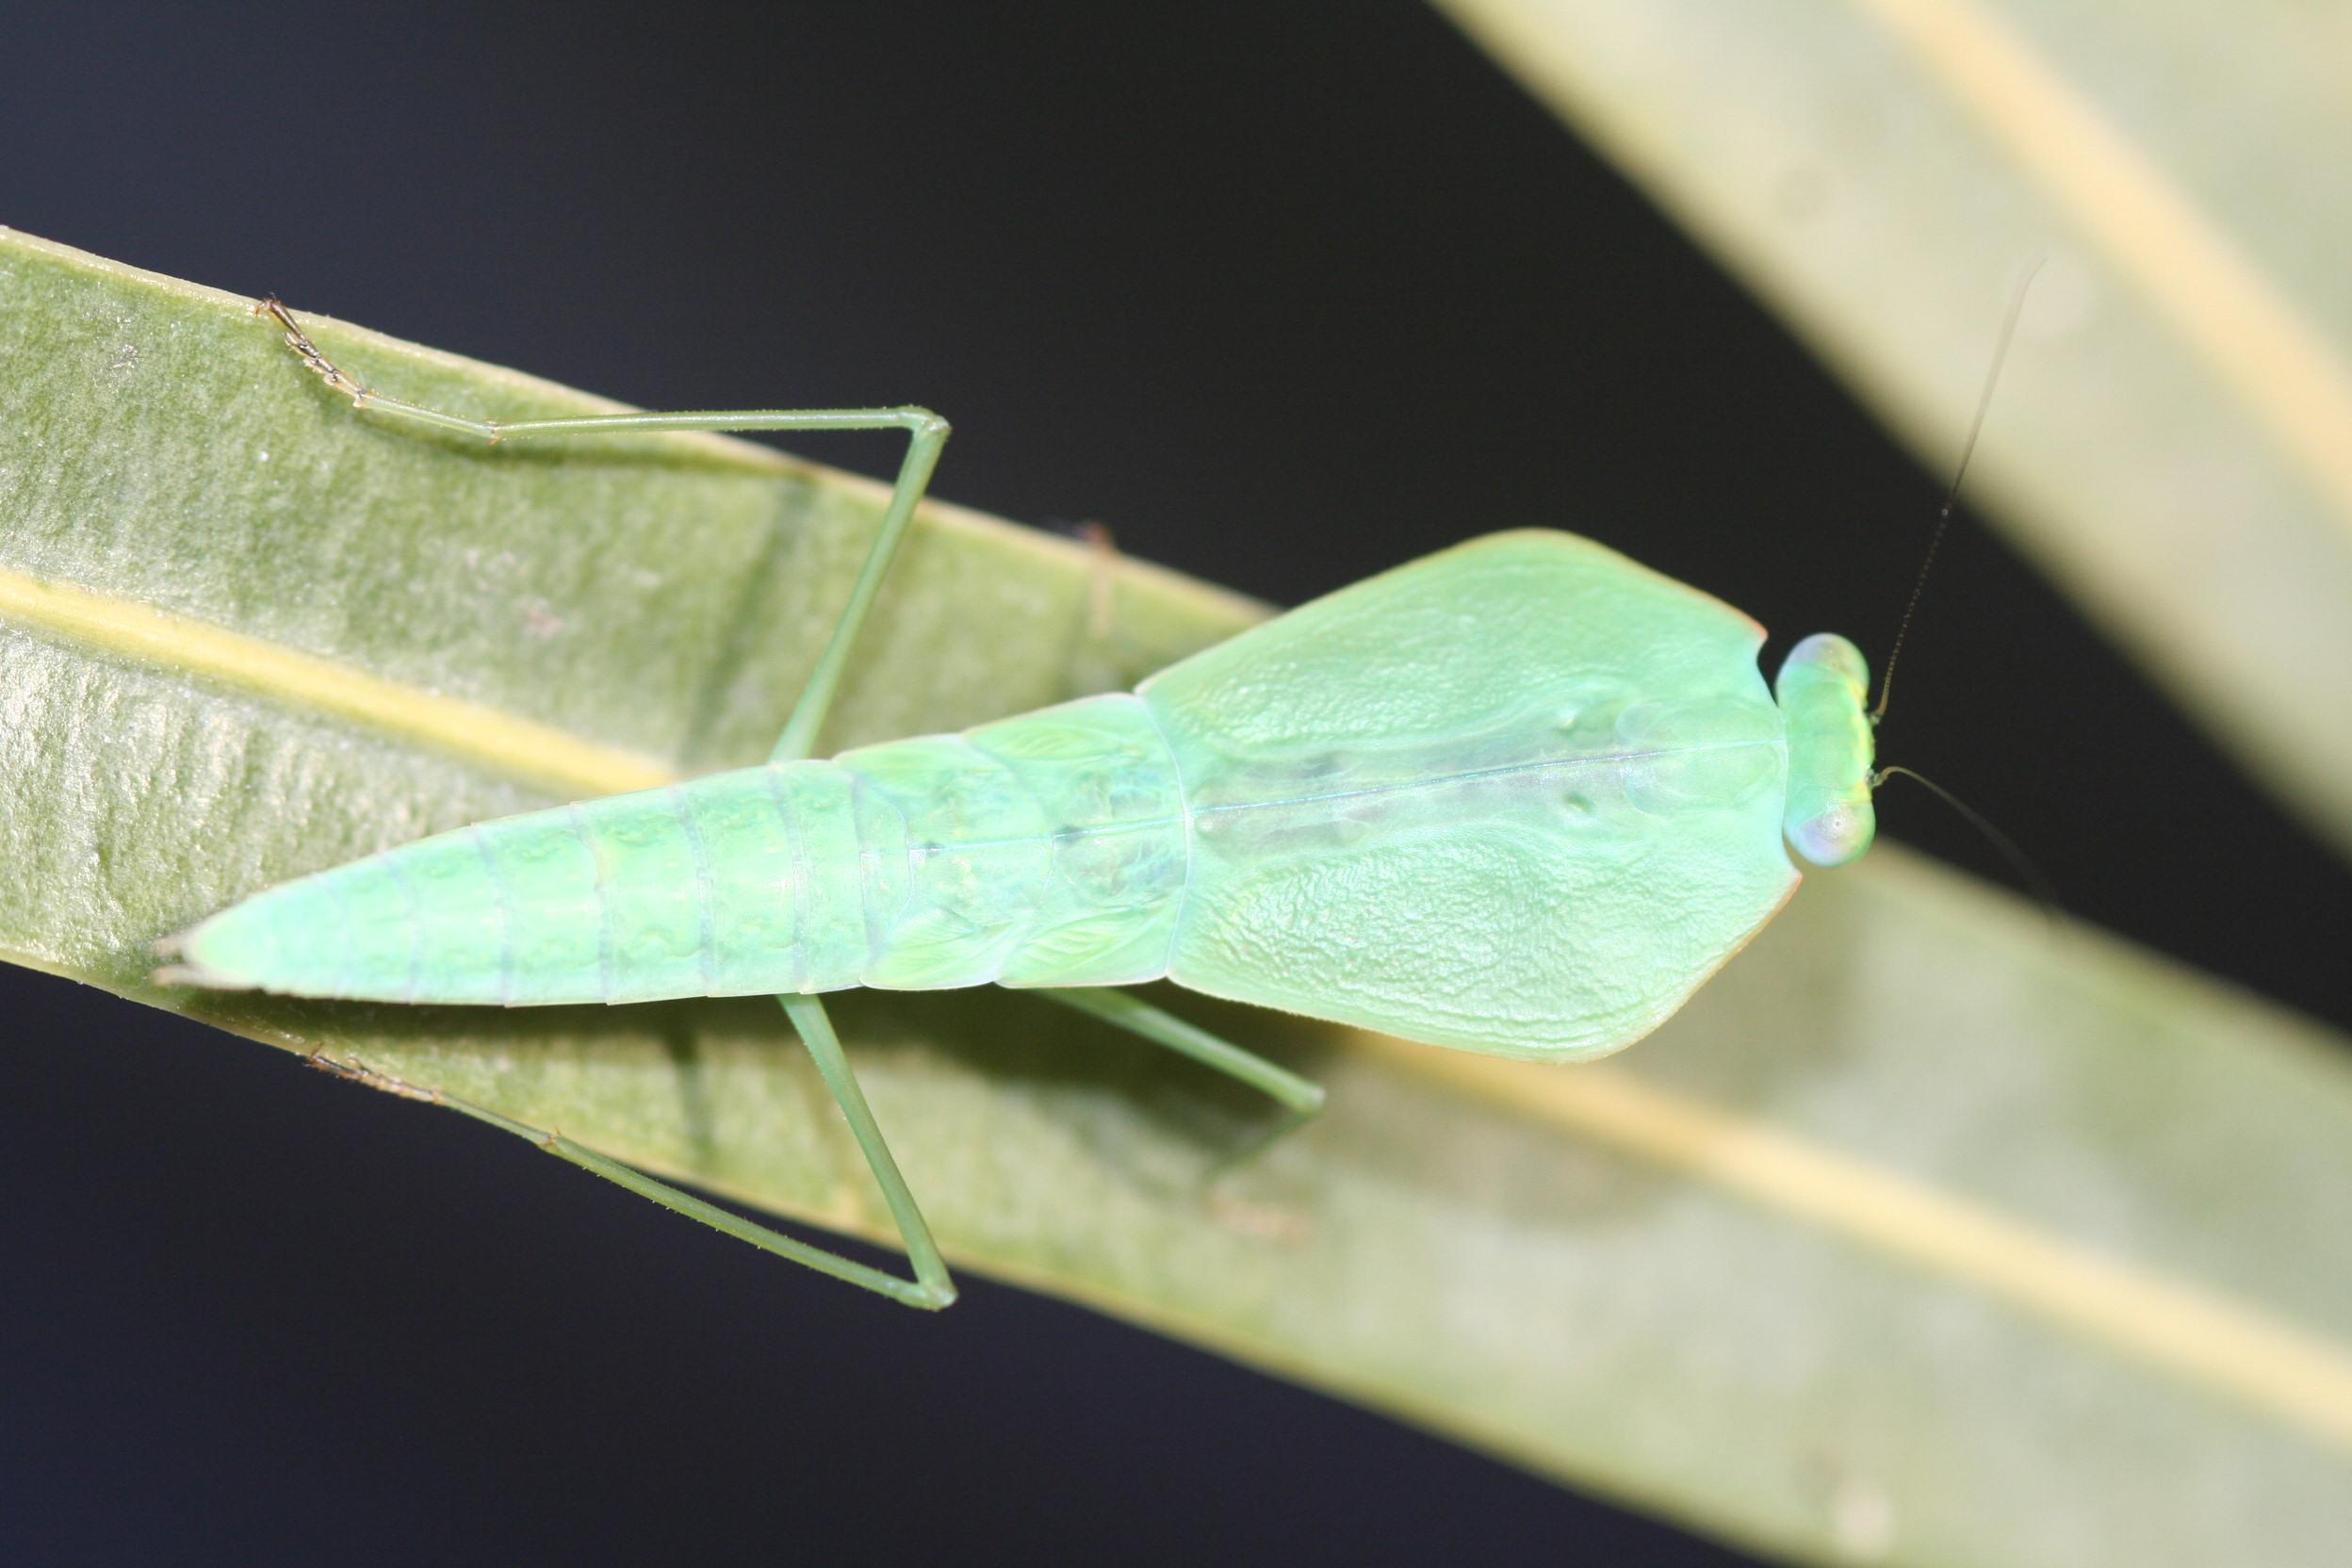 IGM 219, Choeradodis rhombicollis